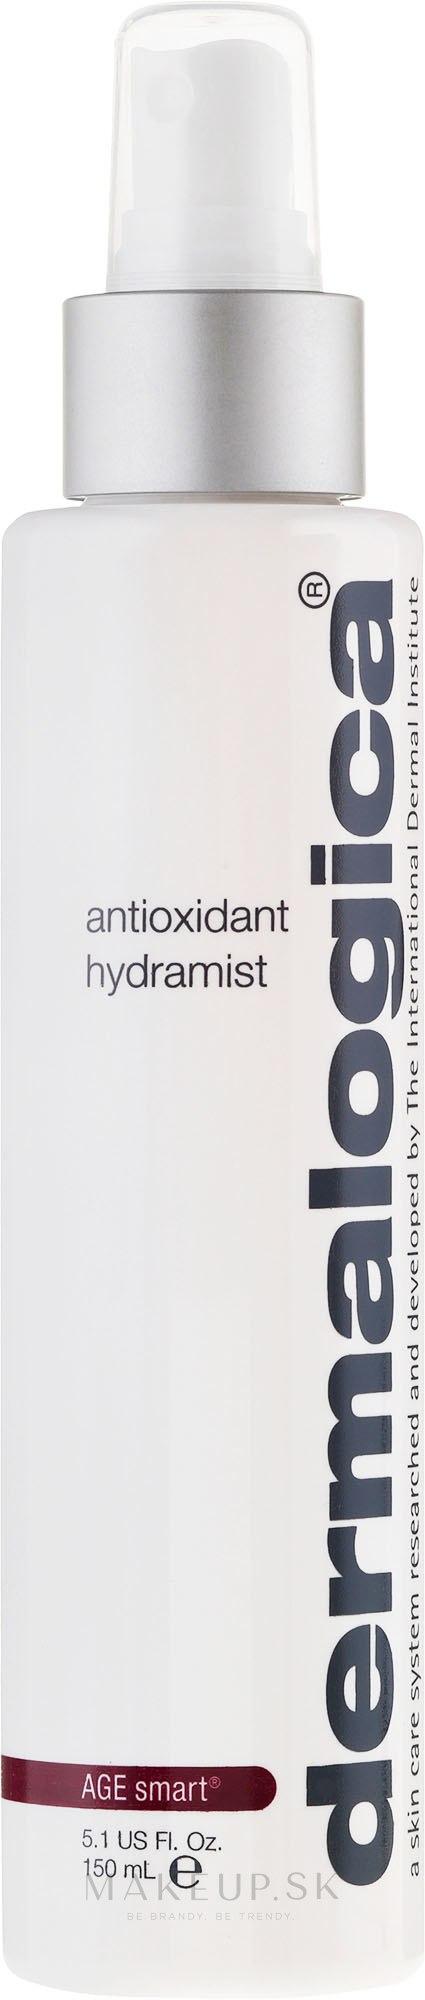 Osviežujúci antioxidant - Dermalogica Age Smart Antioxidant Hydramist — Obrázky 150 ml